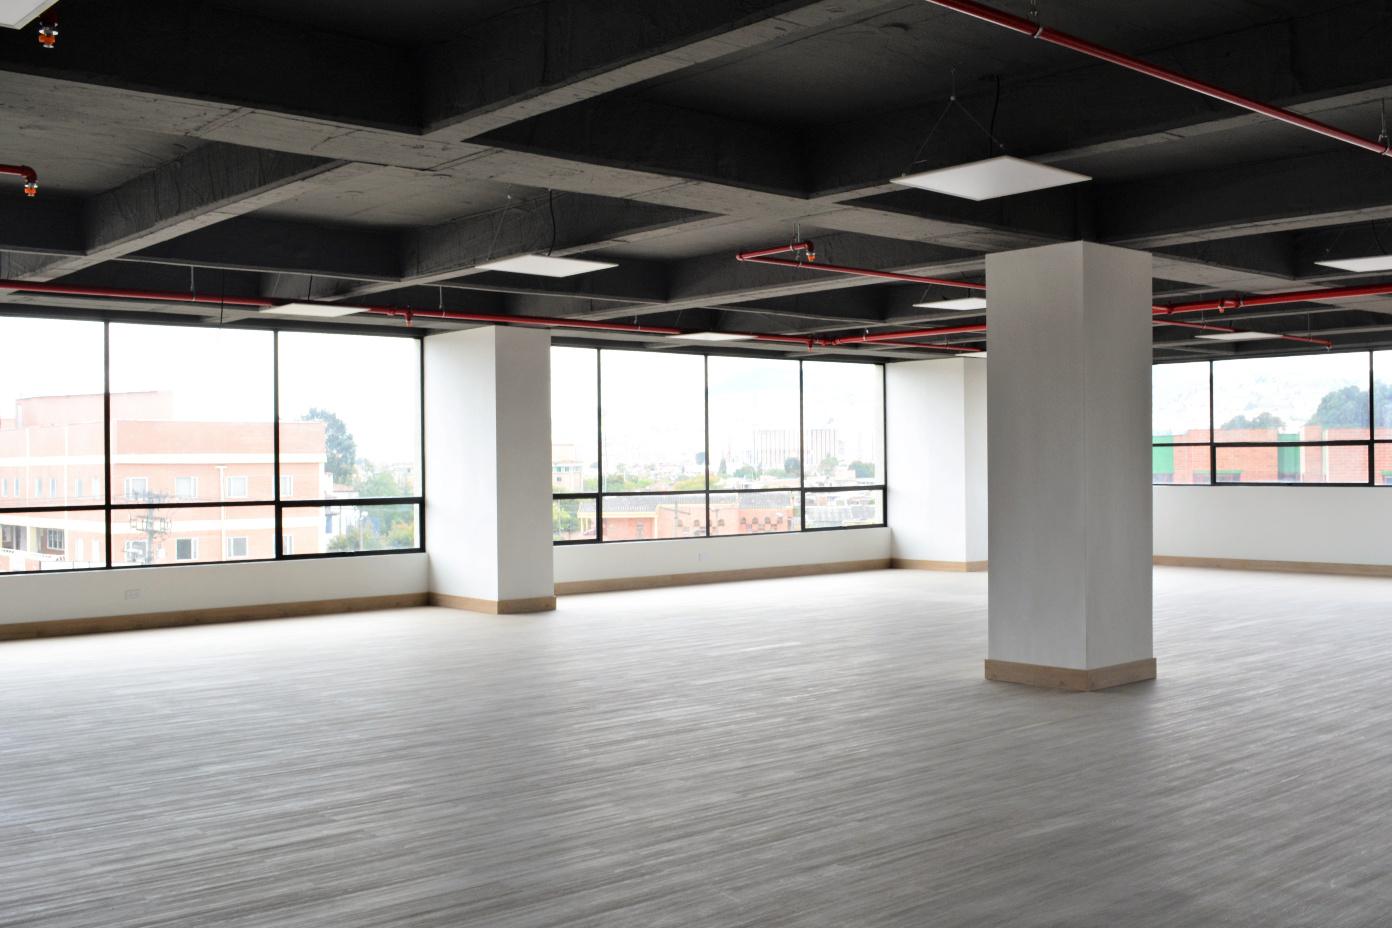 Salón de aeróbicos - Club House - Torres de Timiza, apartamentos en venta, sector Kennedy, Bogotá, vivienda de interés social VIS, aplica subsidio